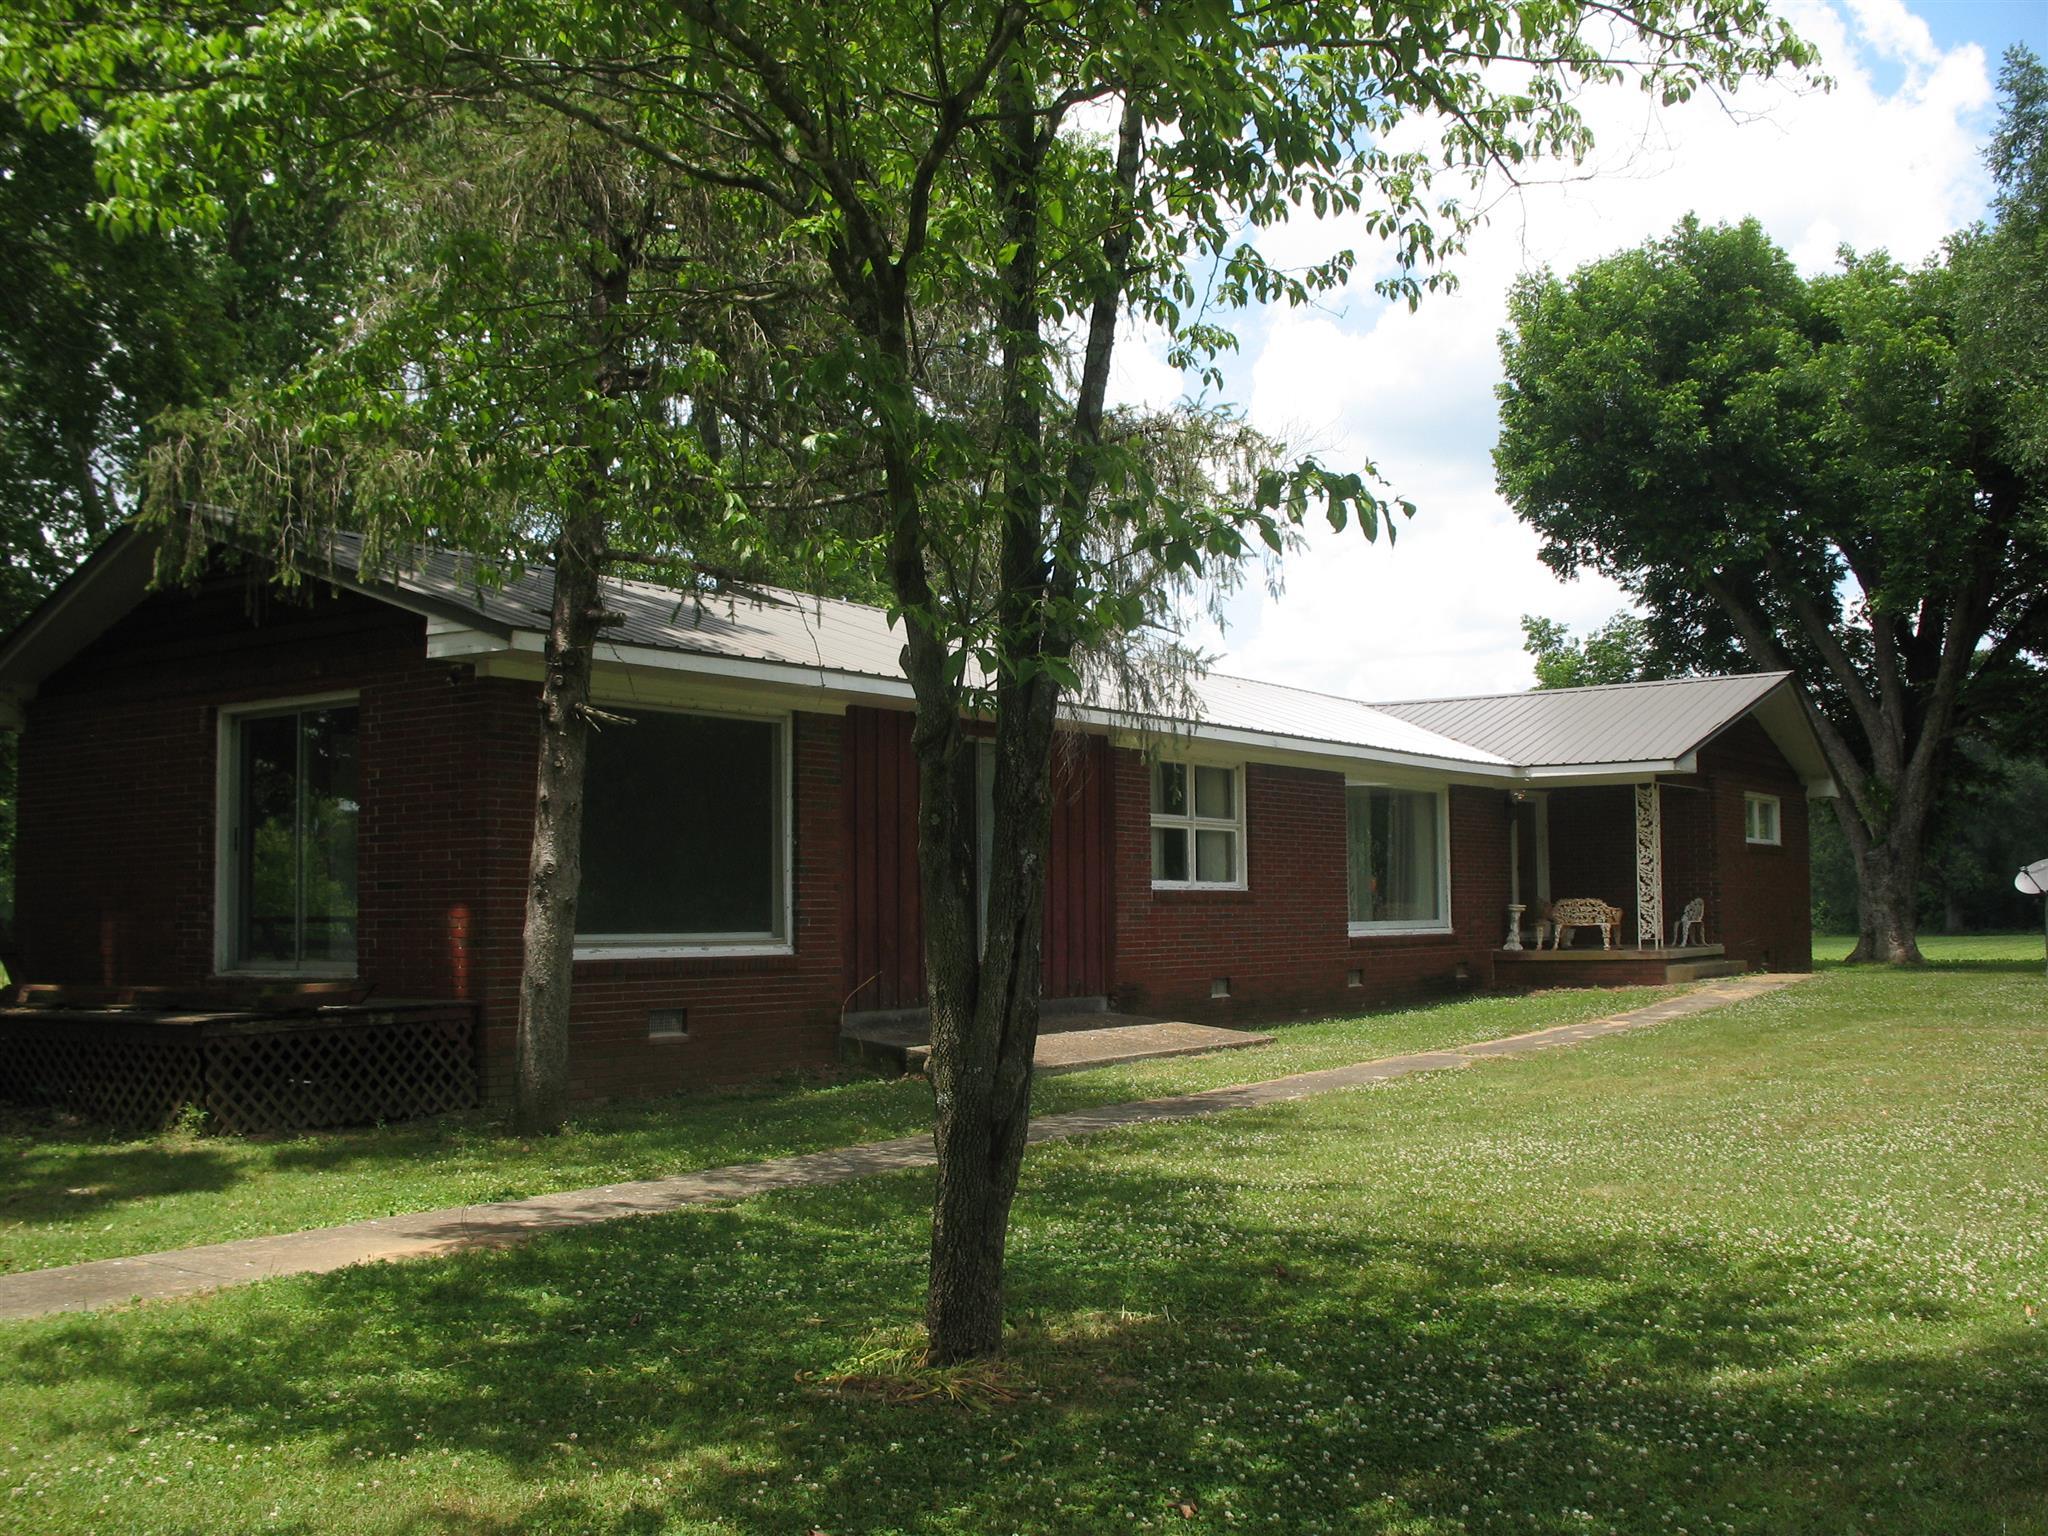 330 Elora Rd, Huntland, TN 37345 - Huntland, TN real estate listing